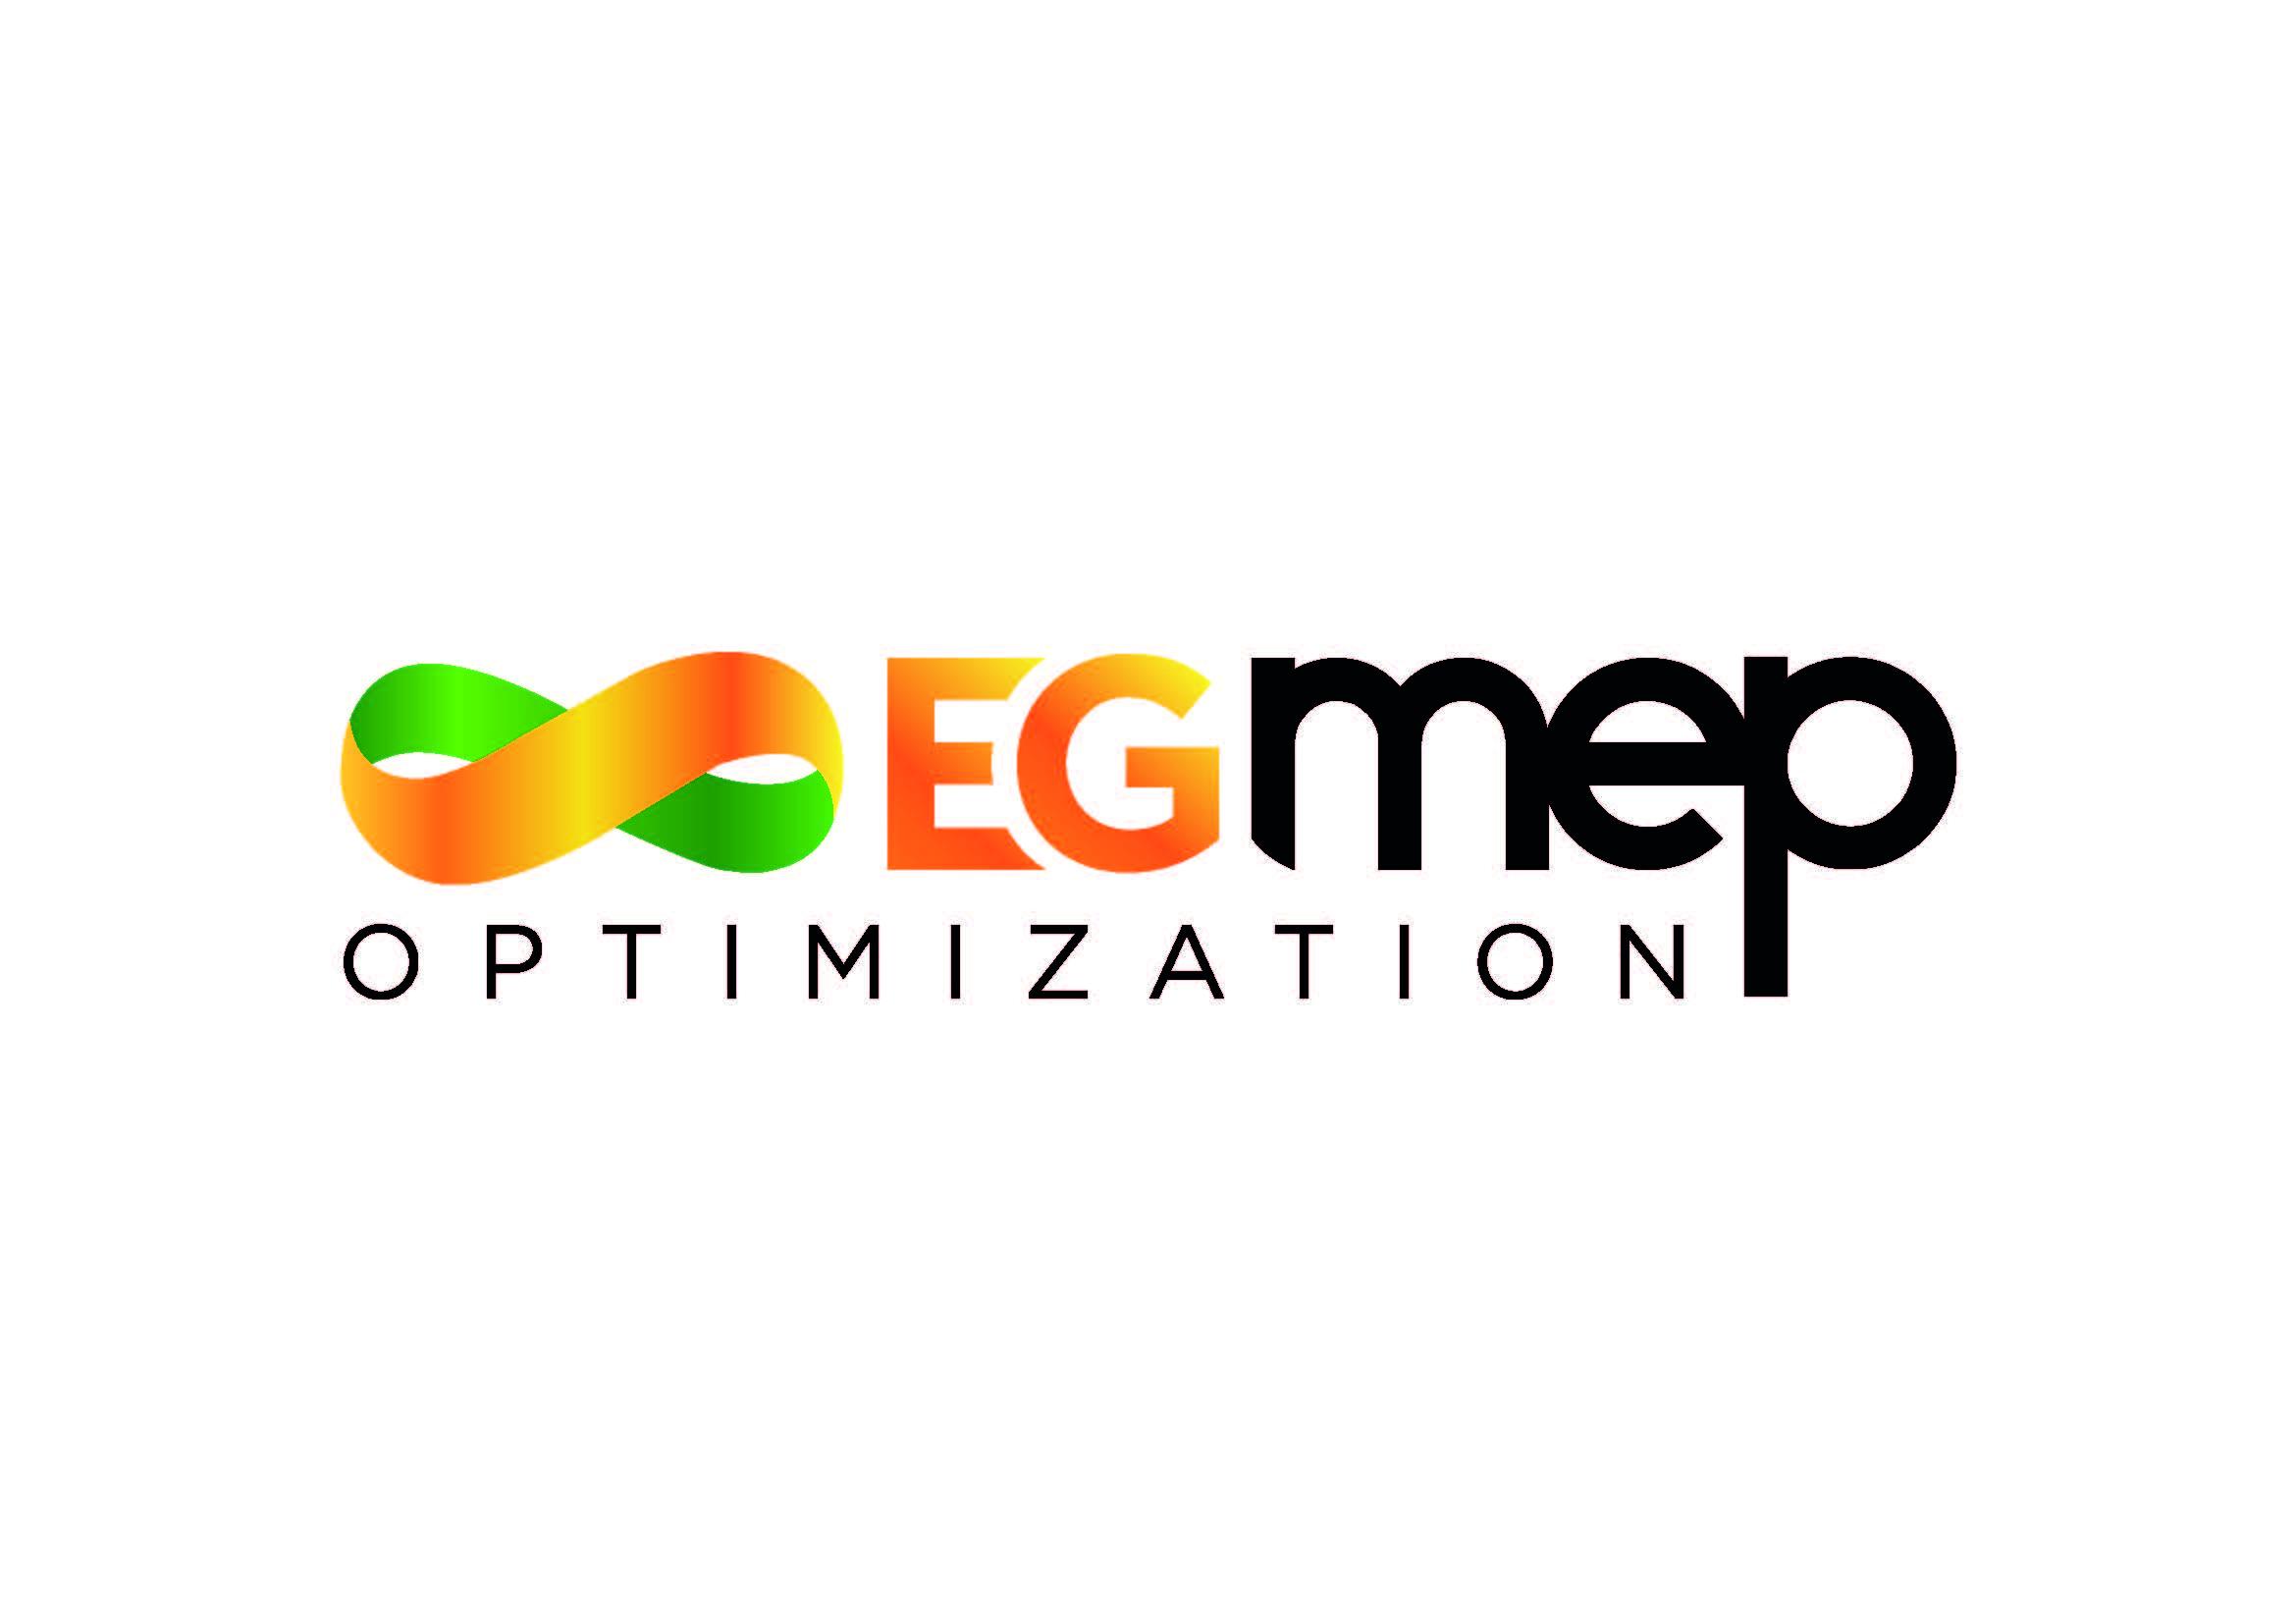 EG-MEP OPTIMIZATION d.o.o.